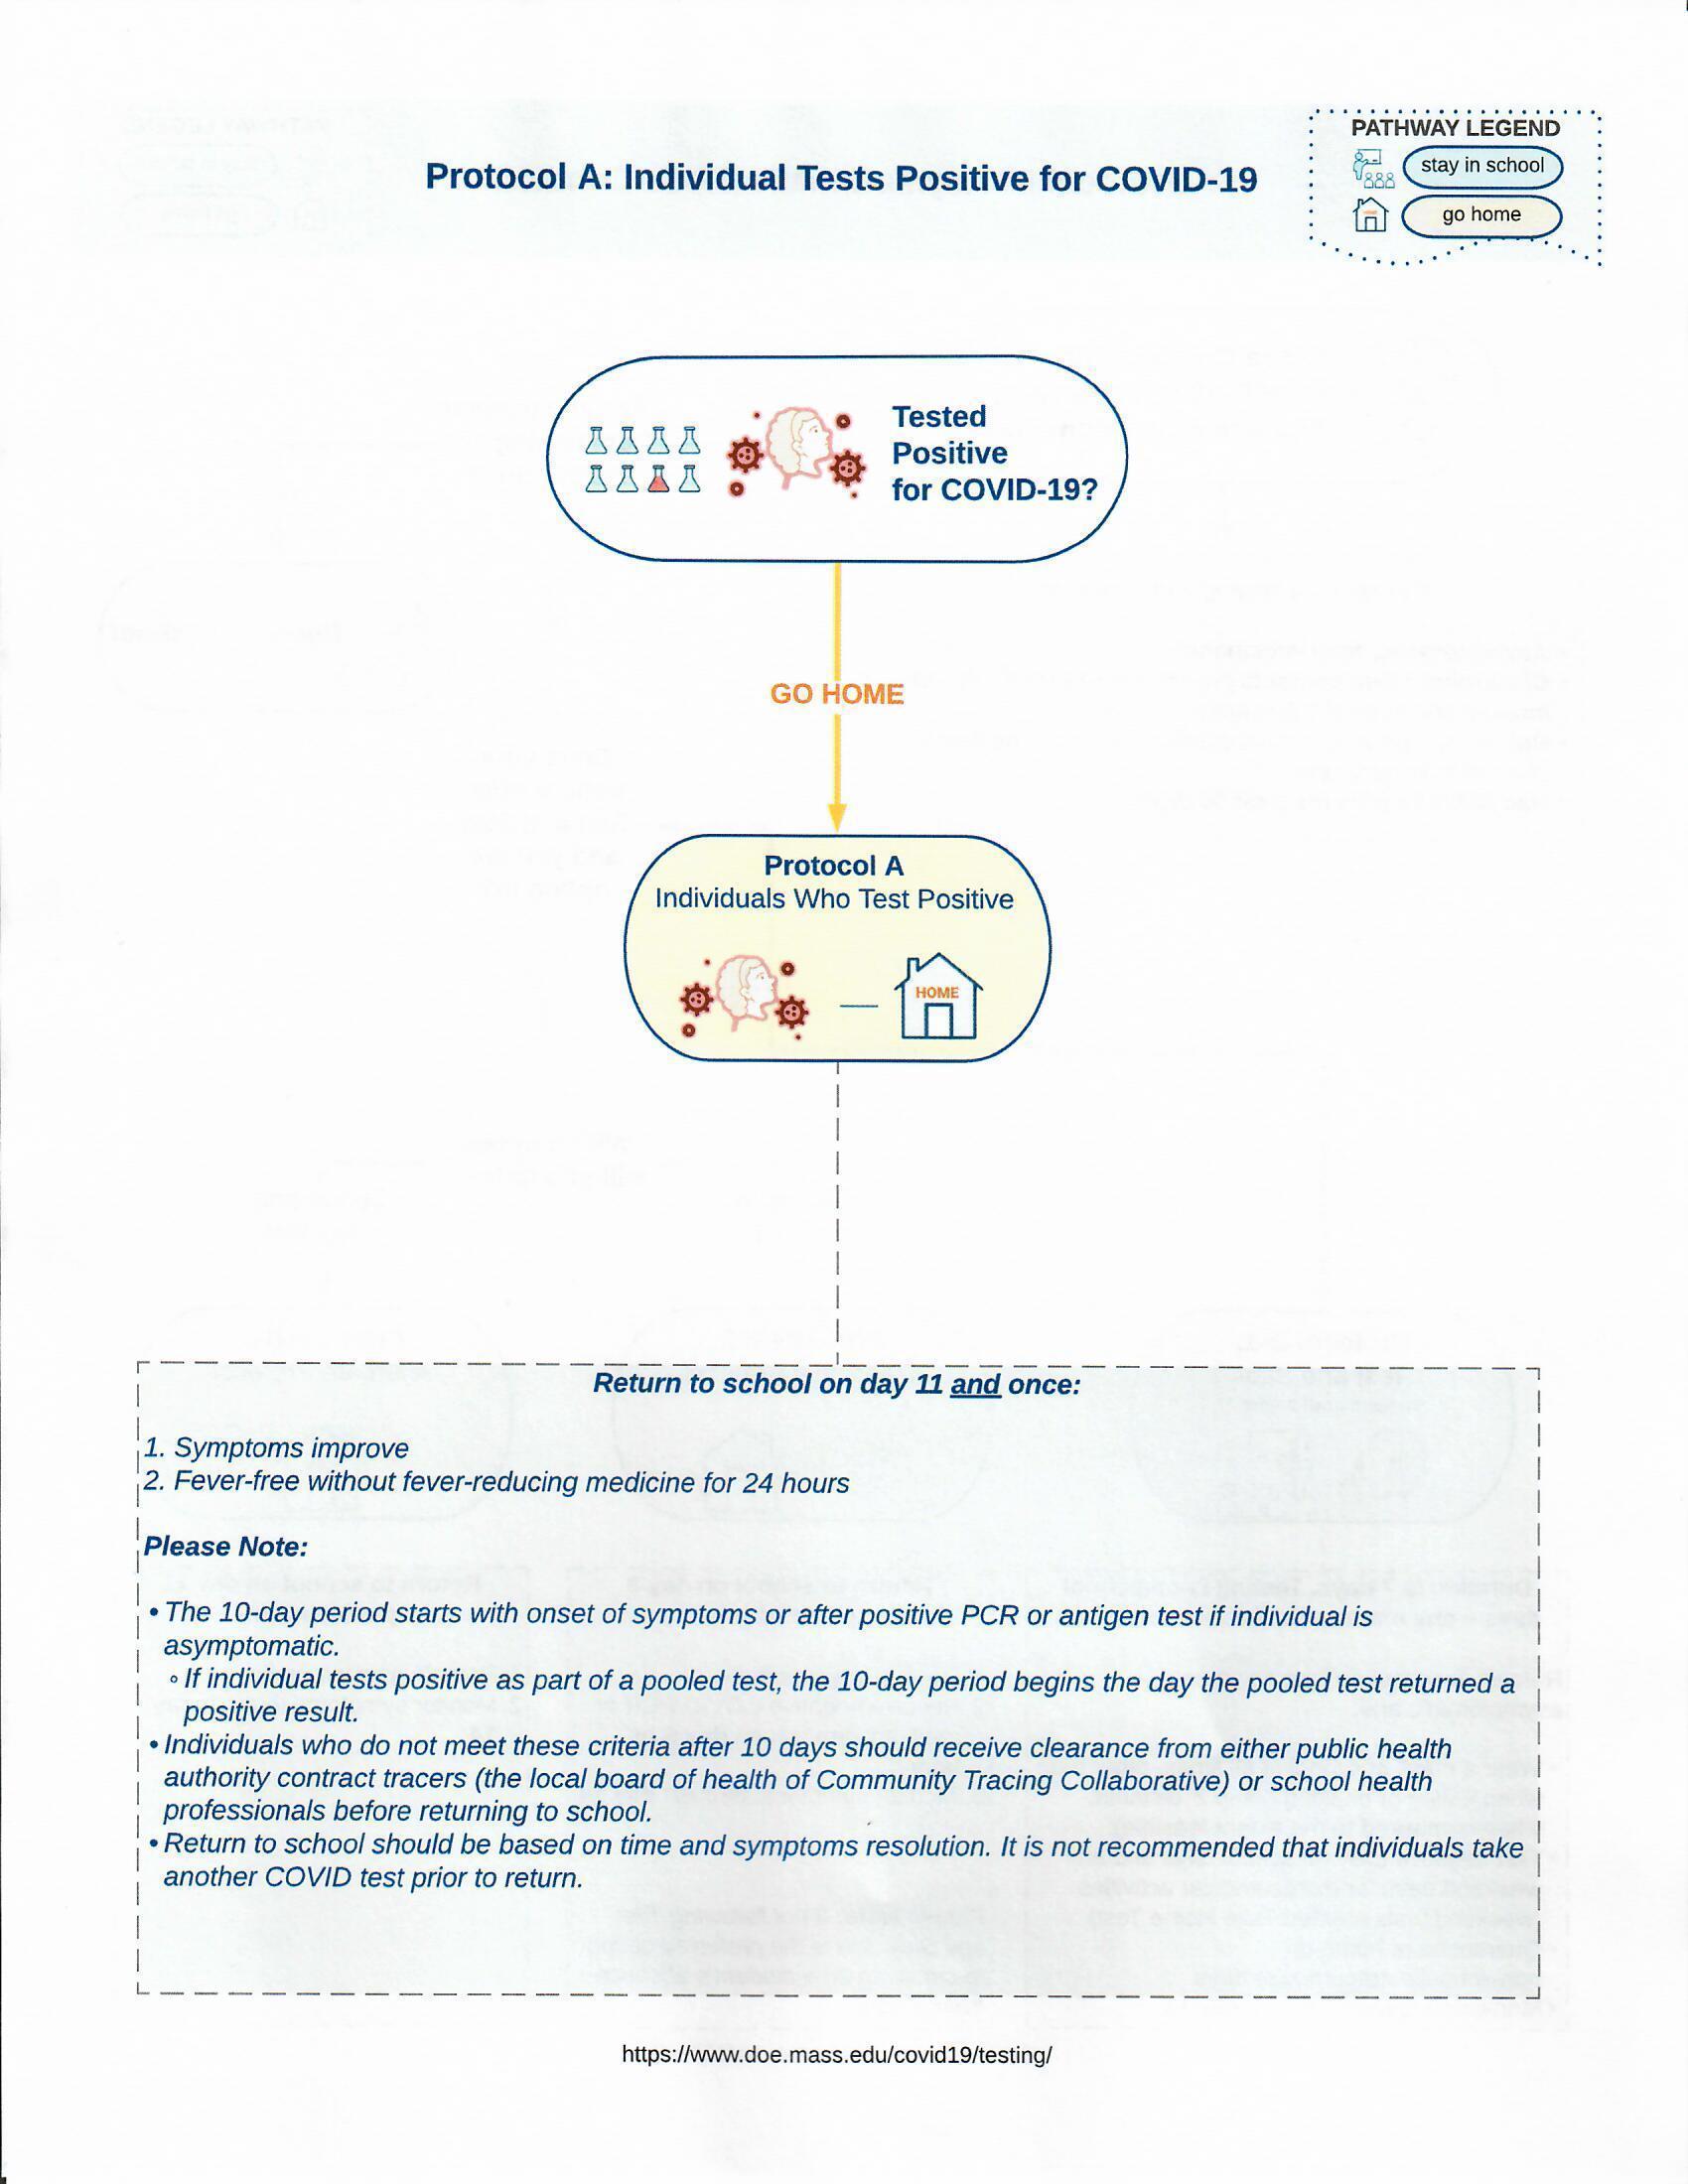 Covid 19 Testing Flow Chart 2/3